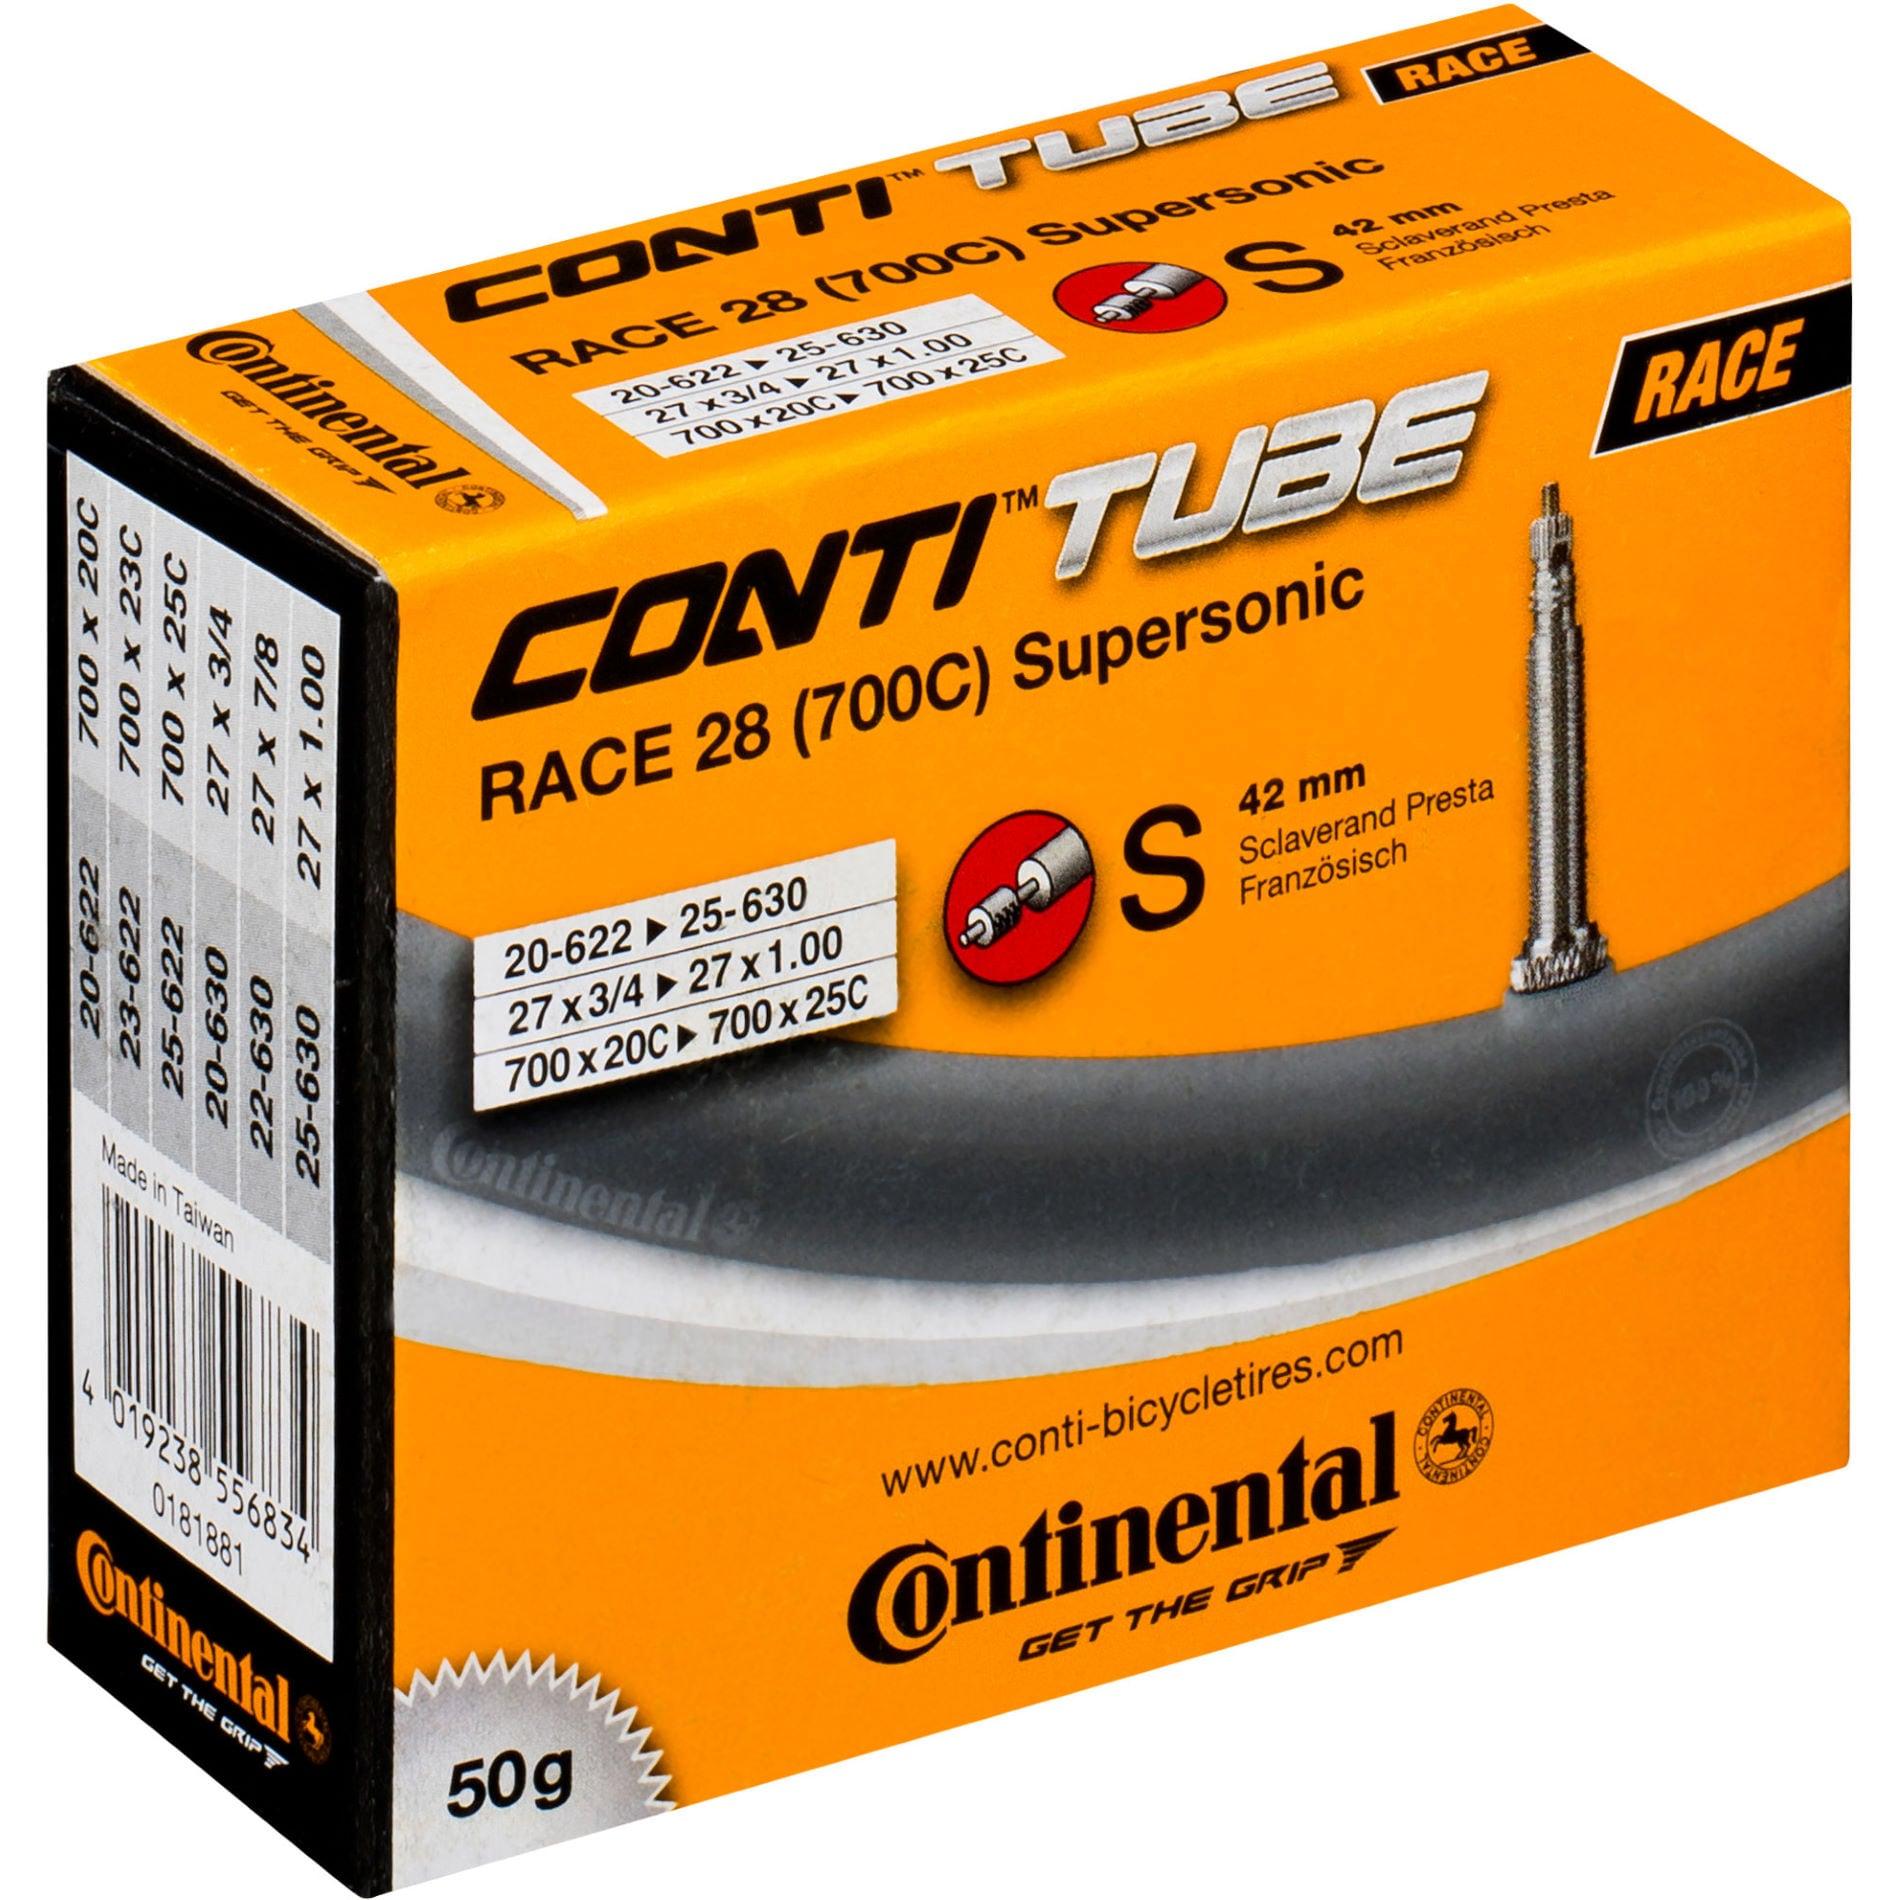 Continental Slang, Race 28 (700C) Supersonic, Presta